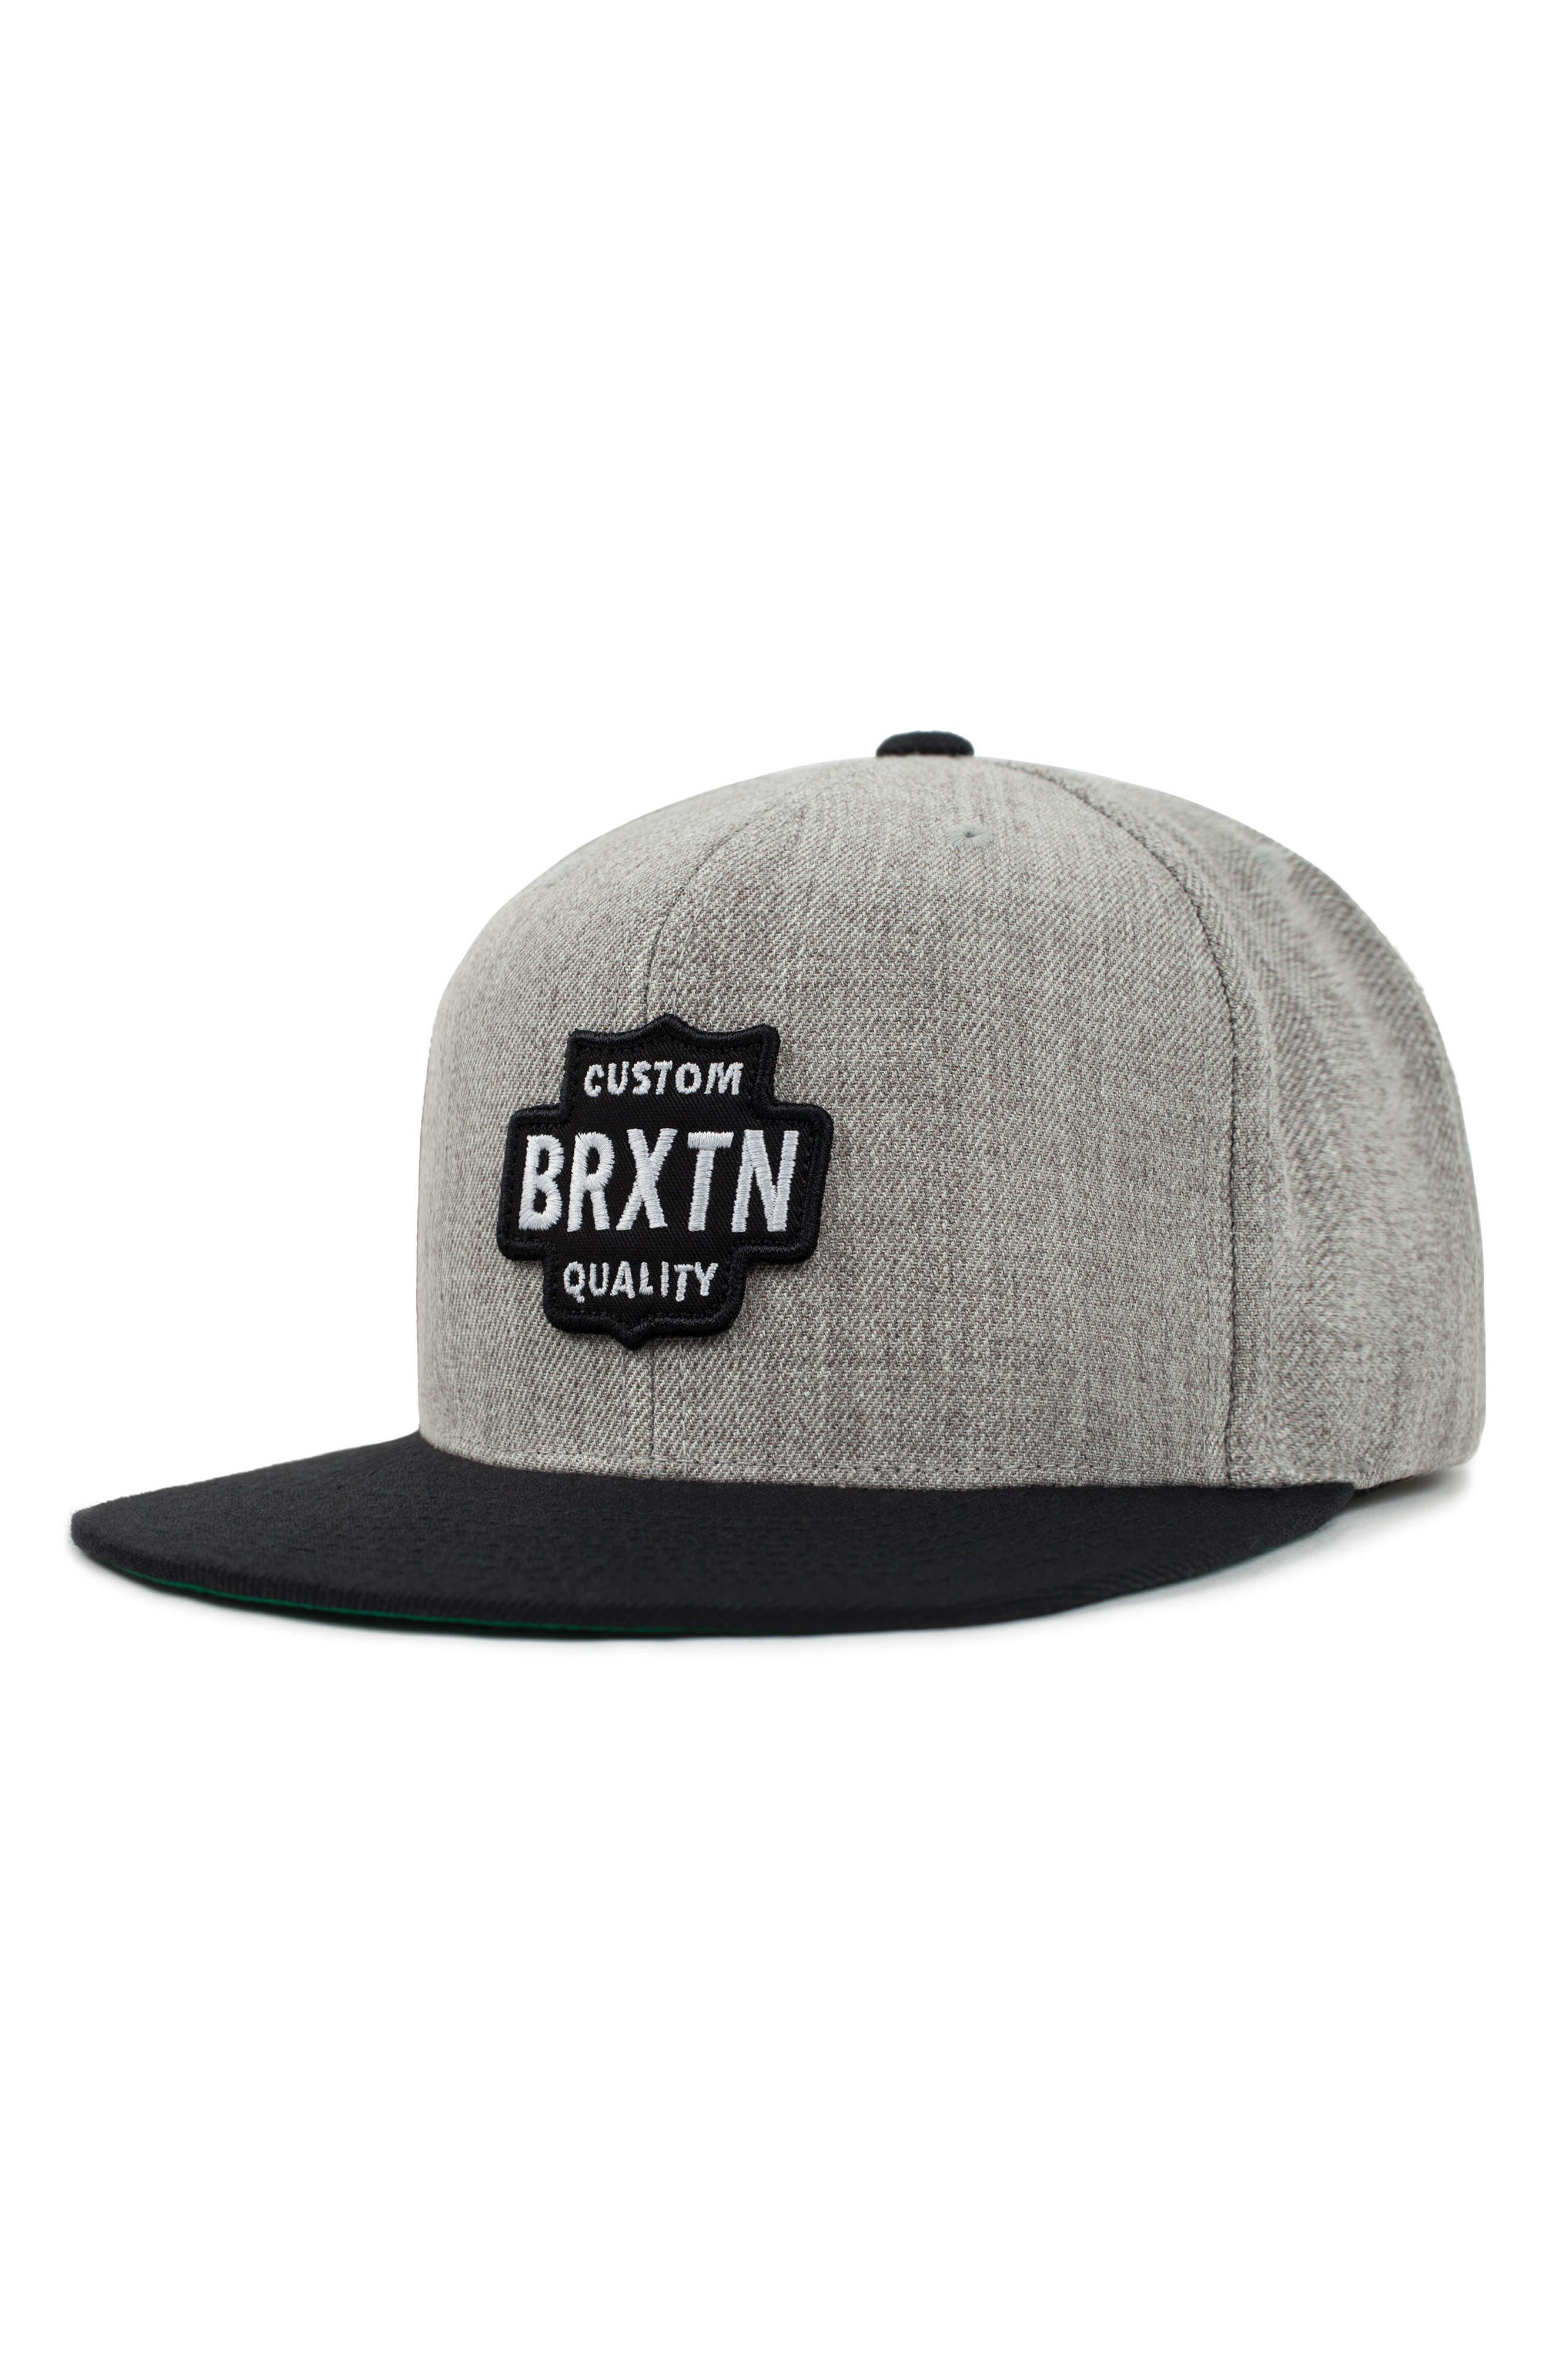 Garth Flat Brimmed Cap,                         Main,                         color, Light Heather Grey/ Black